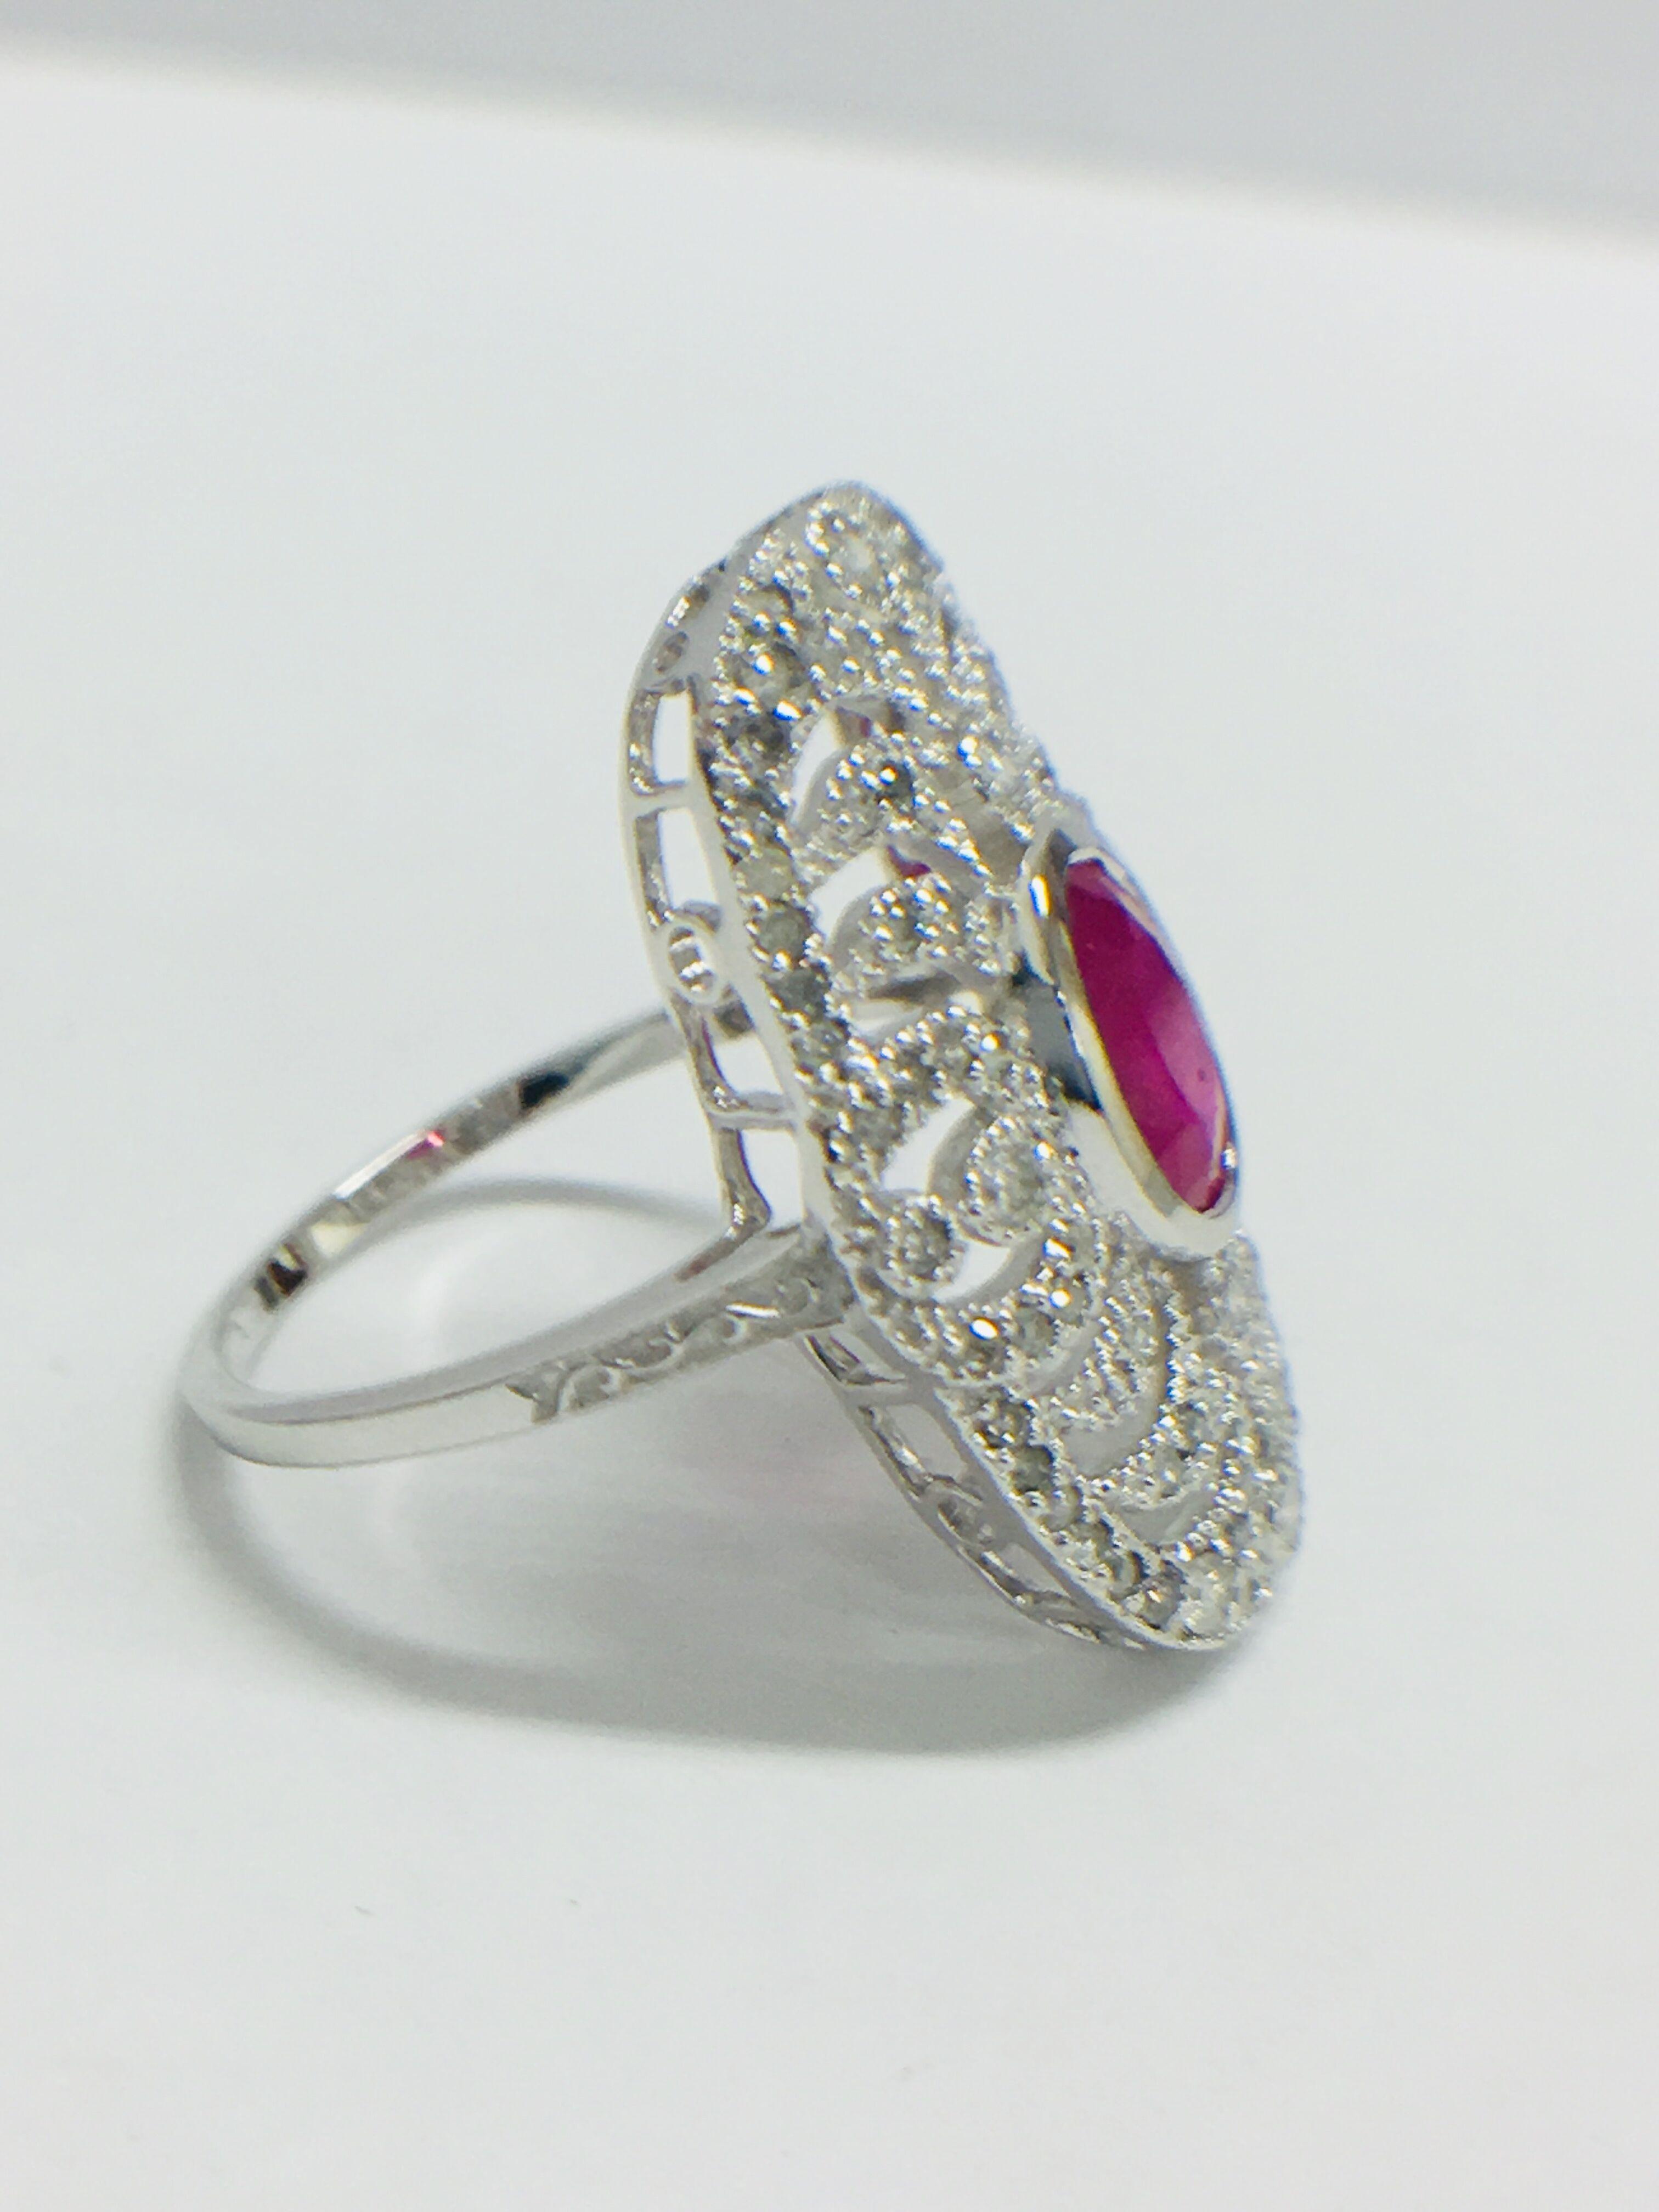 Lot 15 - 18ct White Gold Ruby & Diamond Ring.